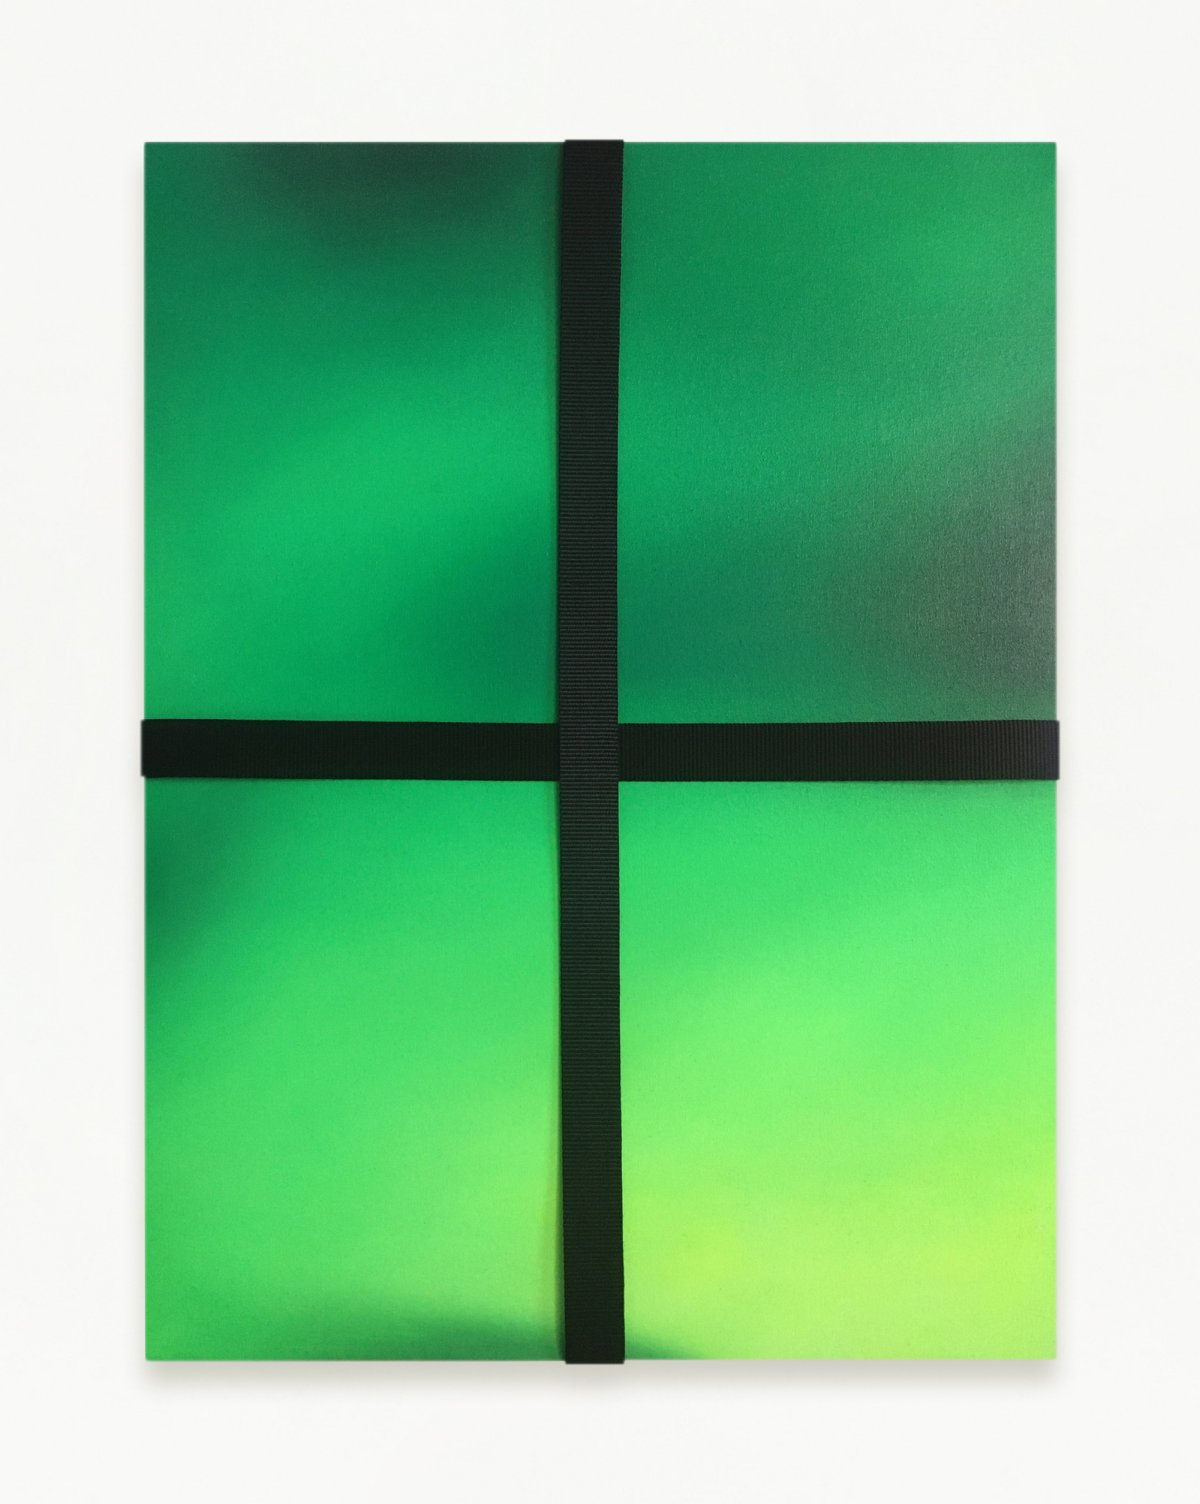 Windows 2020 (green)